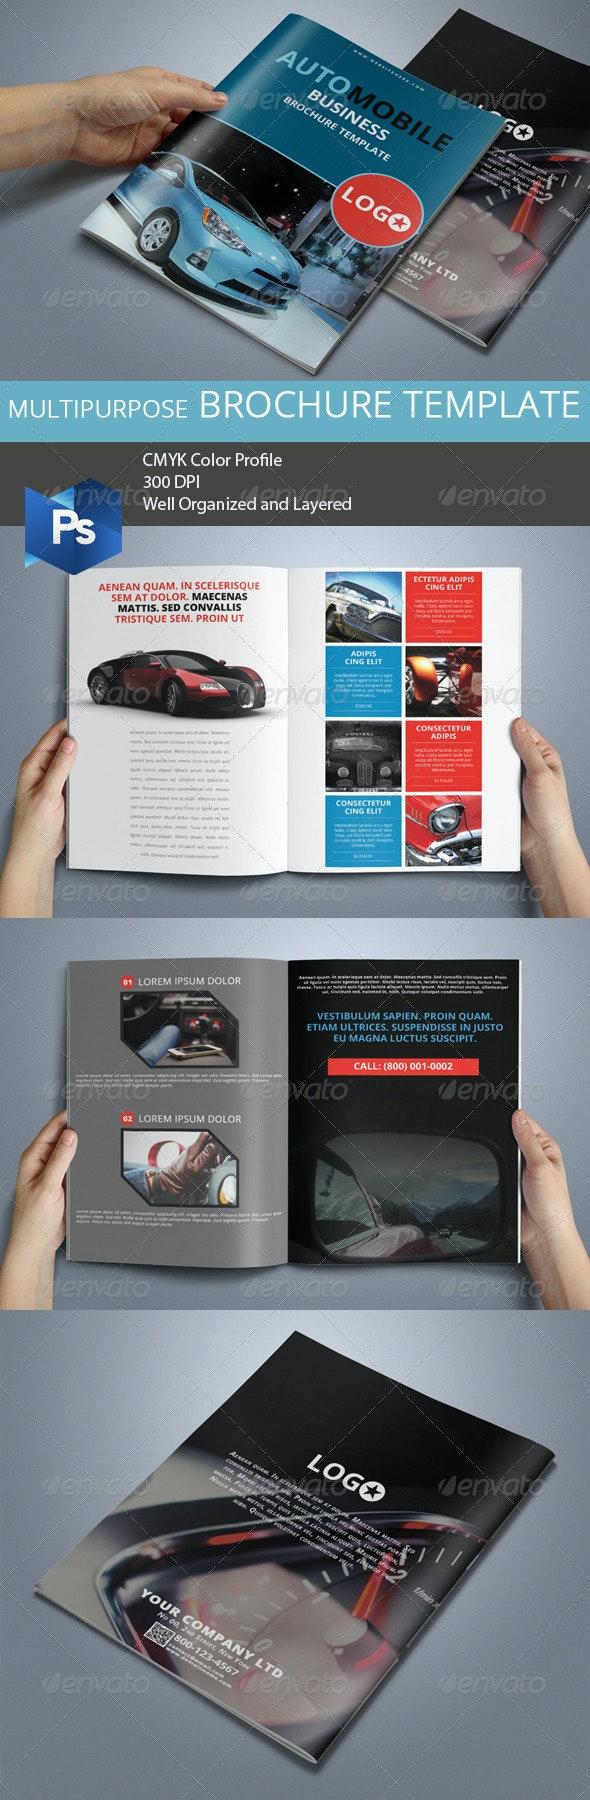 Multipurpose Business Brochure 01 - Corporate Brochures